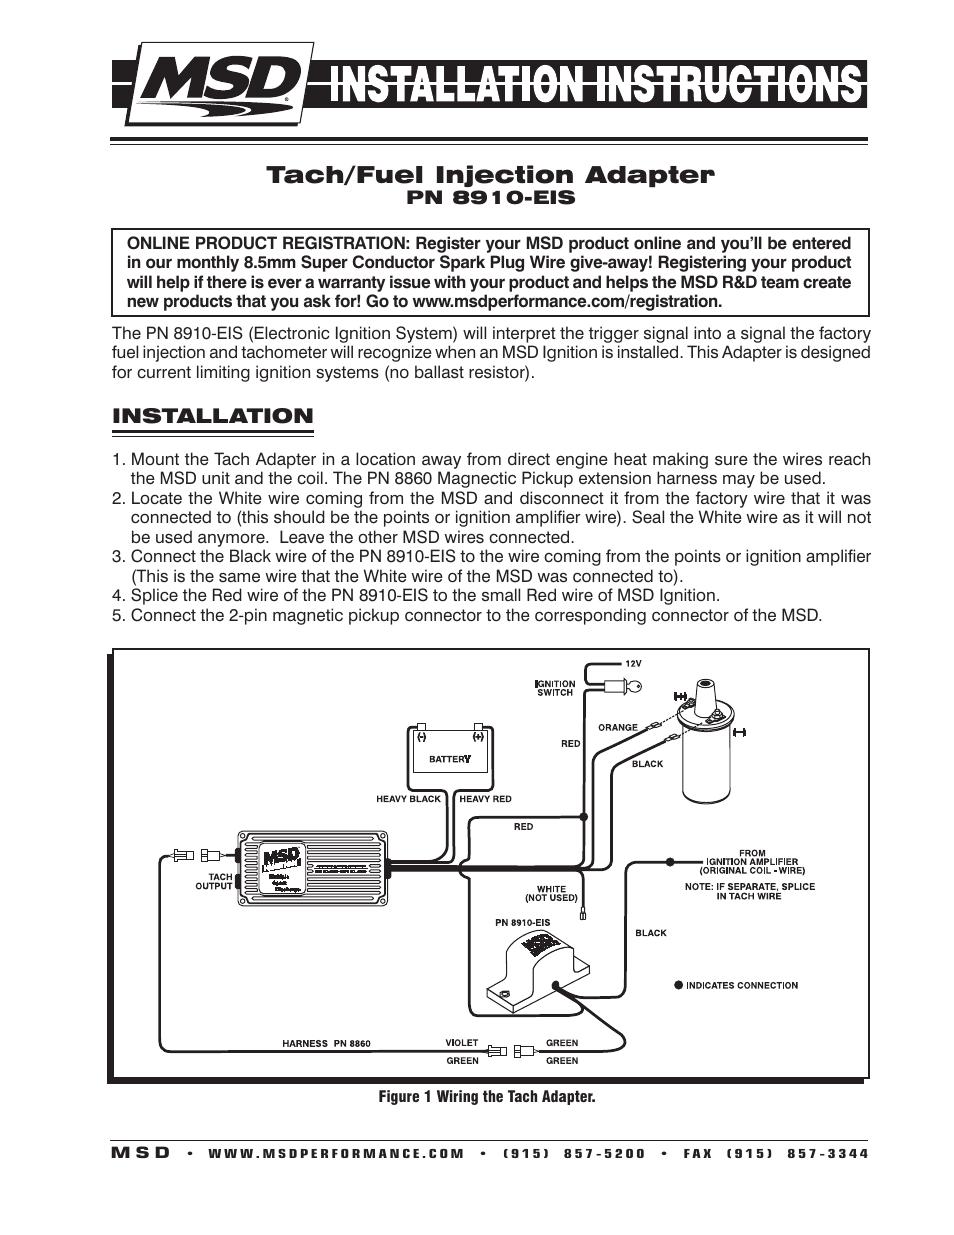 hight resolution of msd 8860 wiring harnes